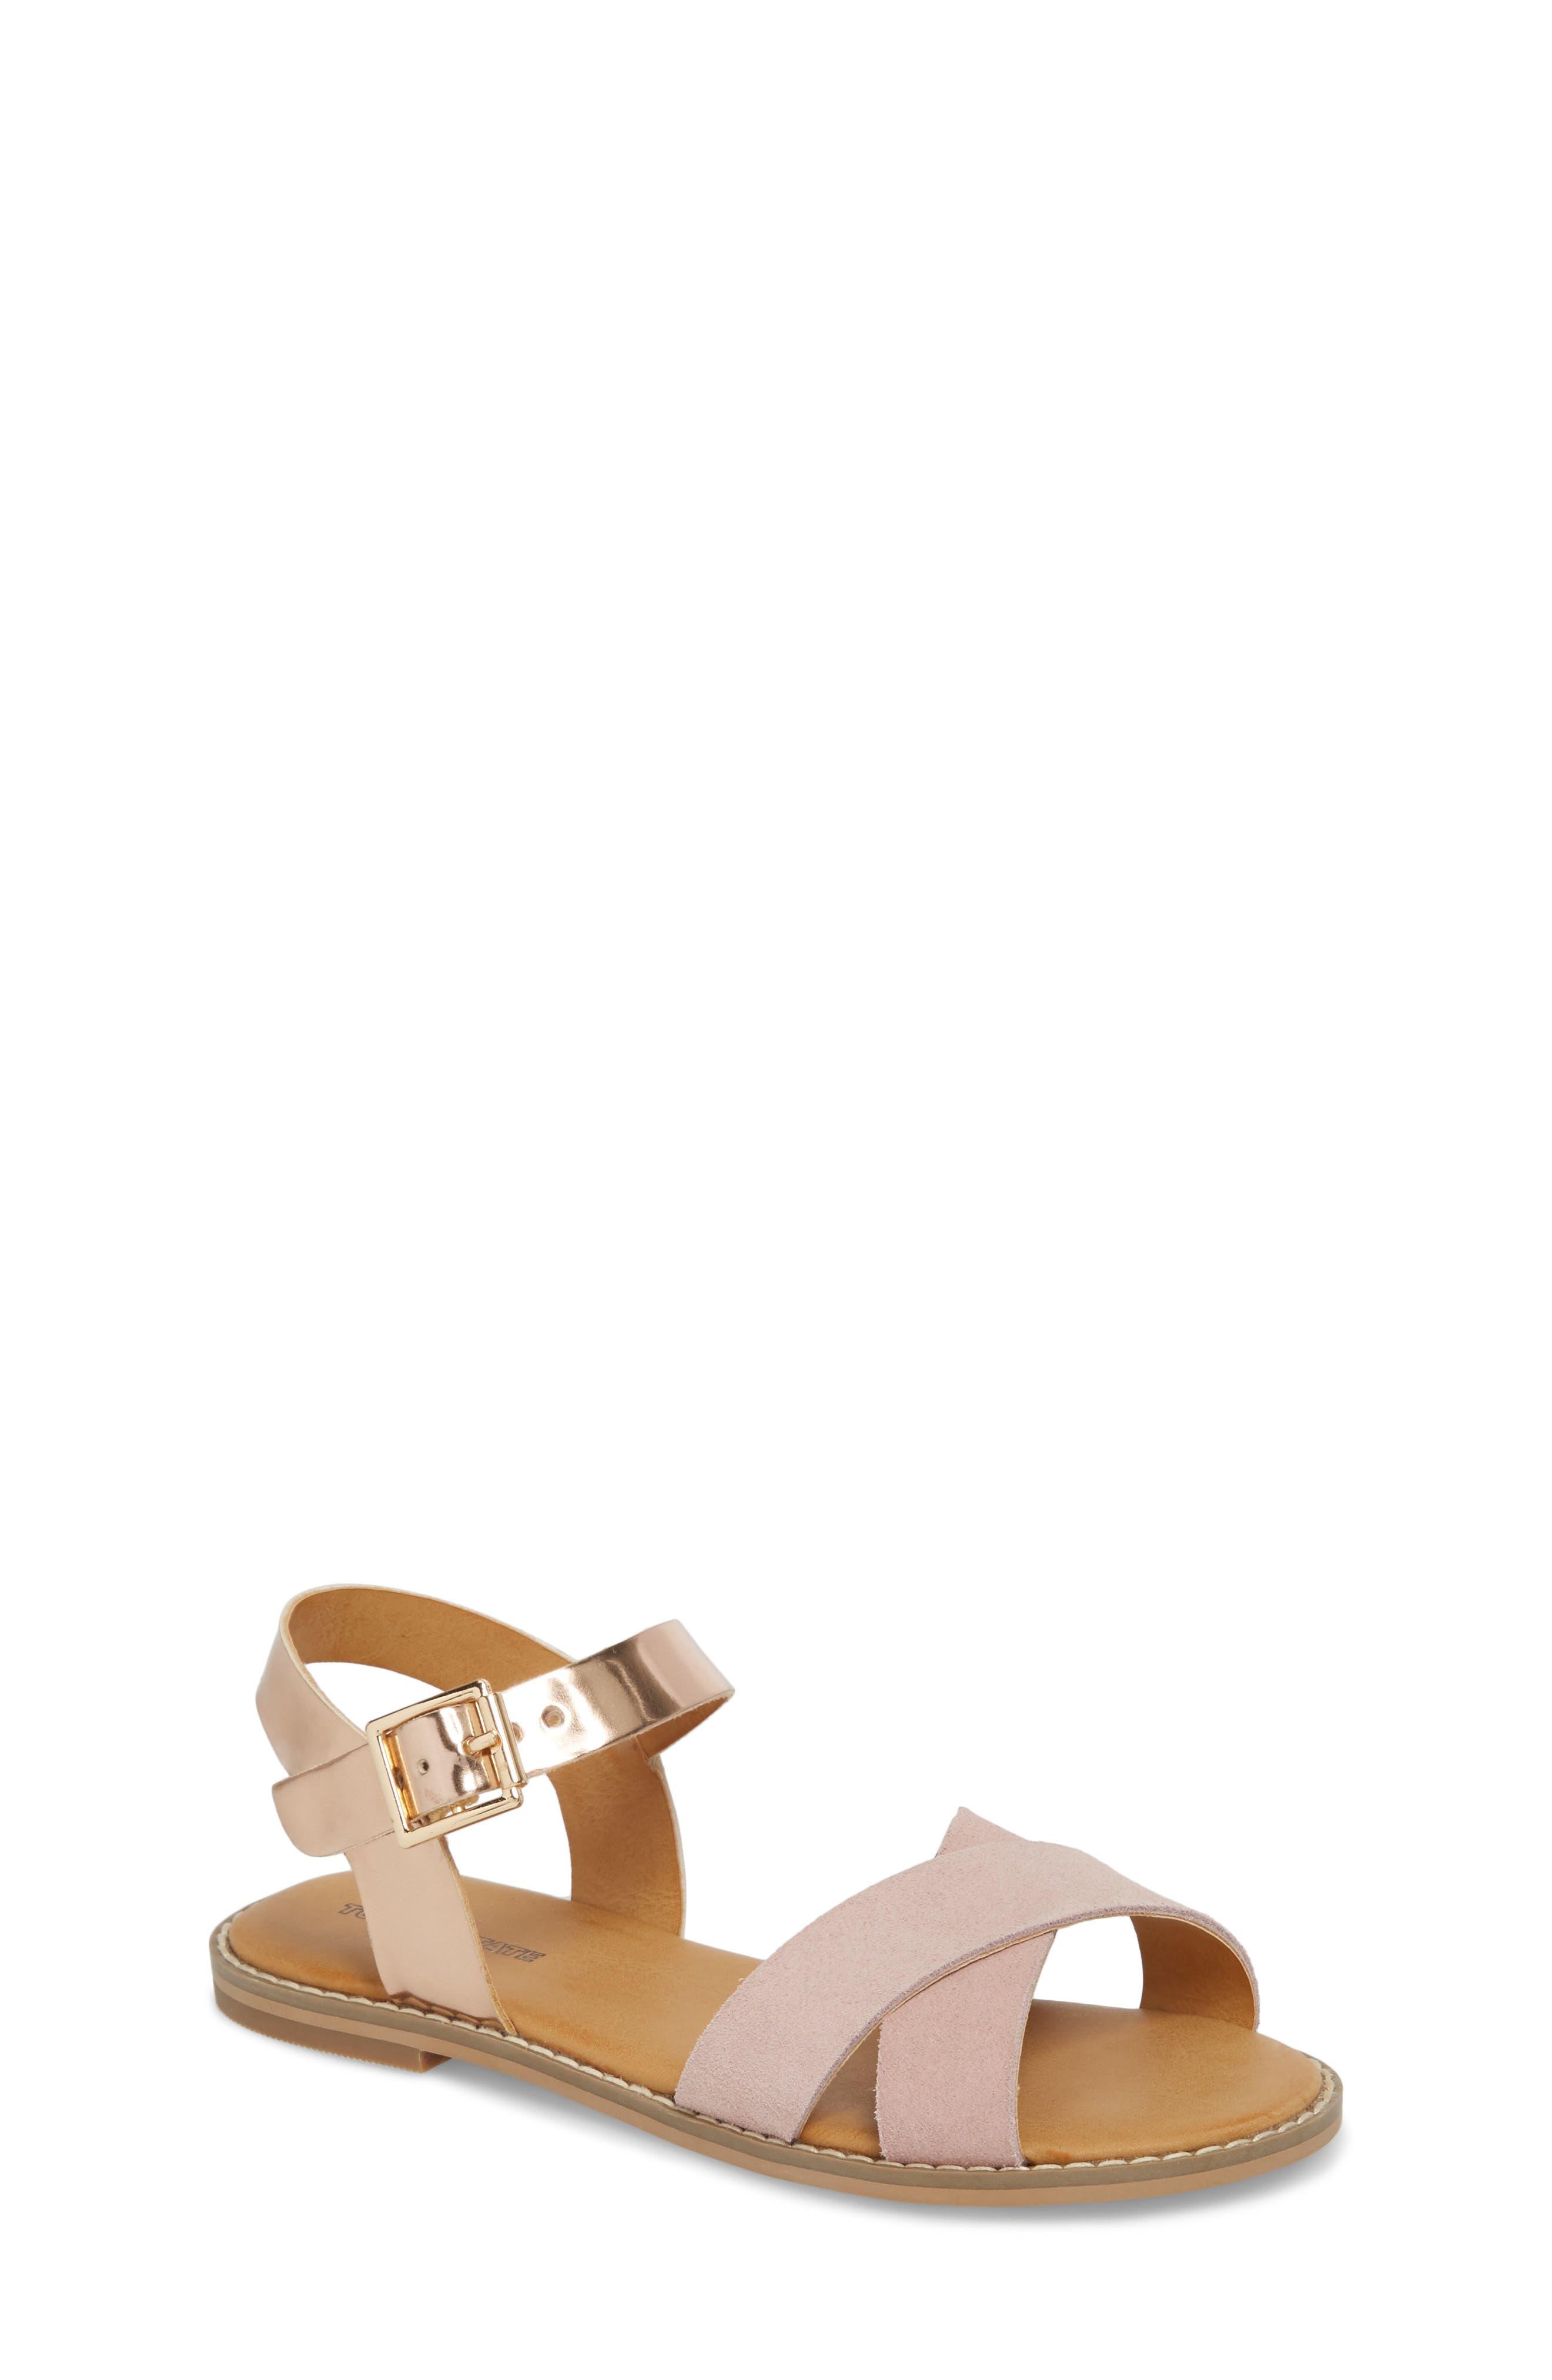 Arya Cross Strap Sandal,                             Main thumbnail 1, color,                             Rose Gold Faux Lea